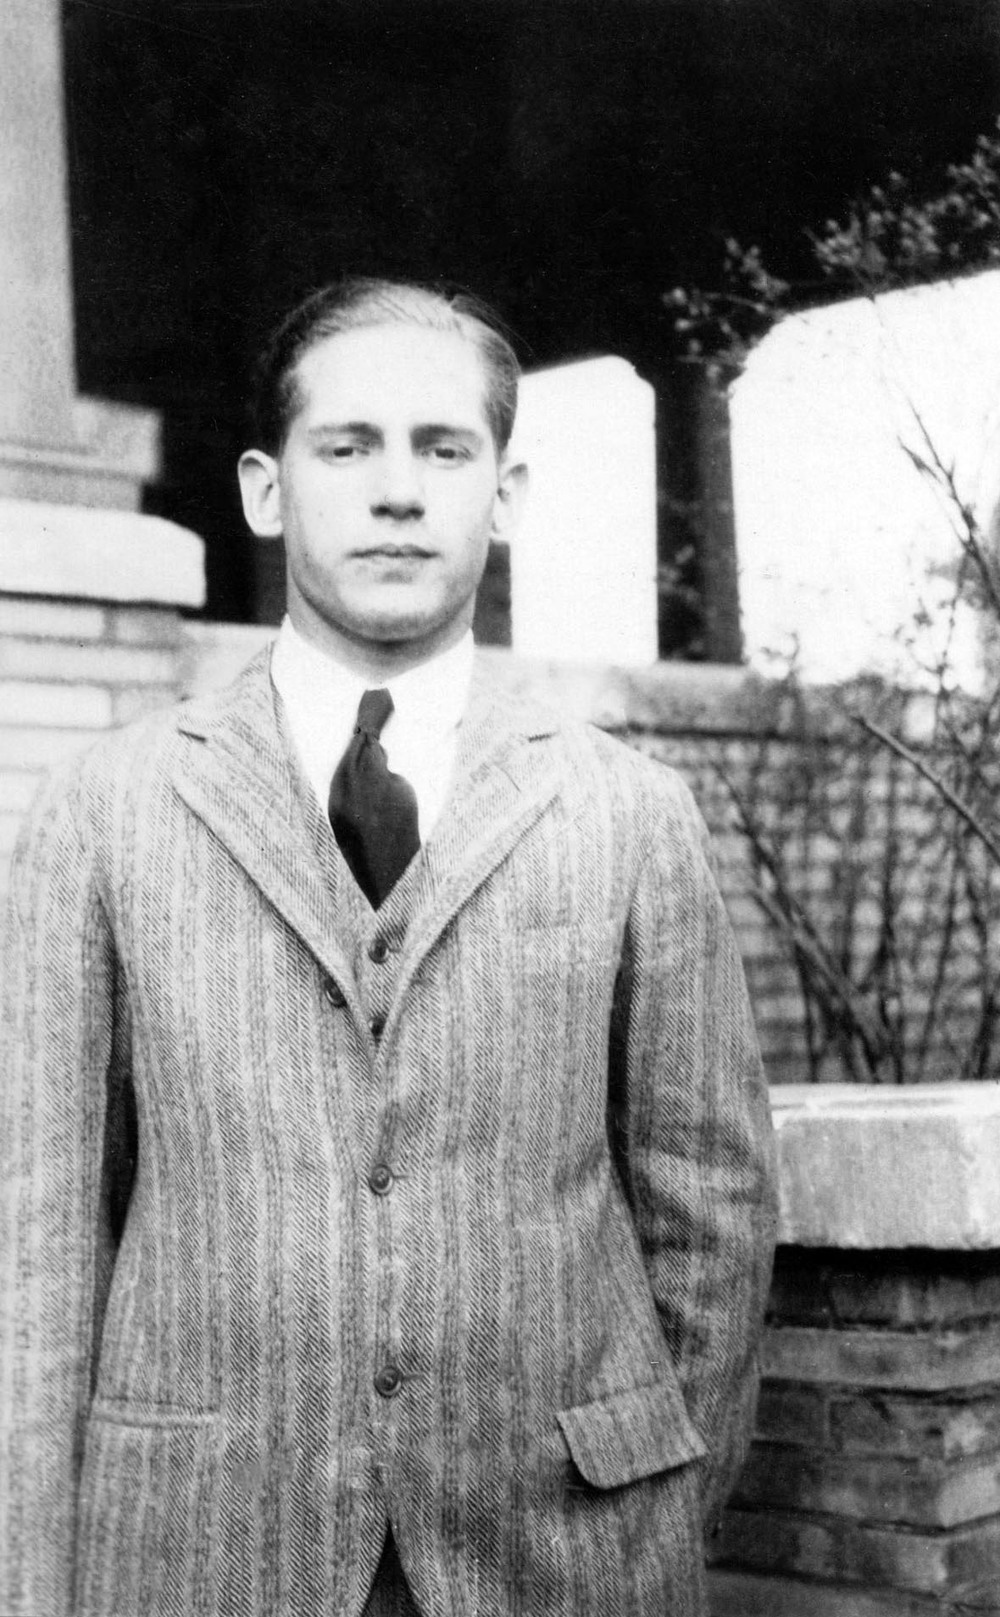 Roy S. Maize 1932